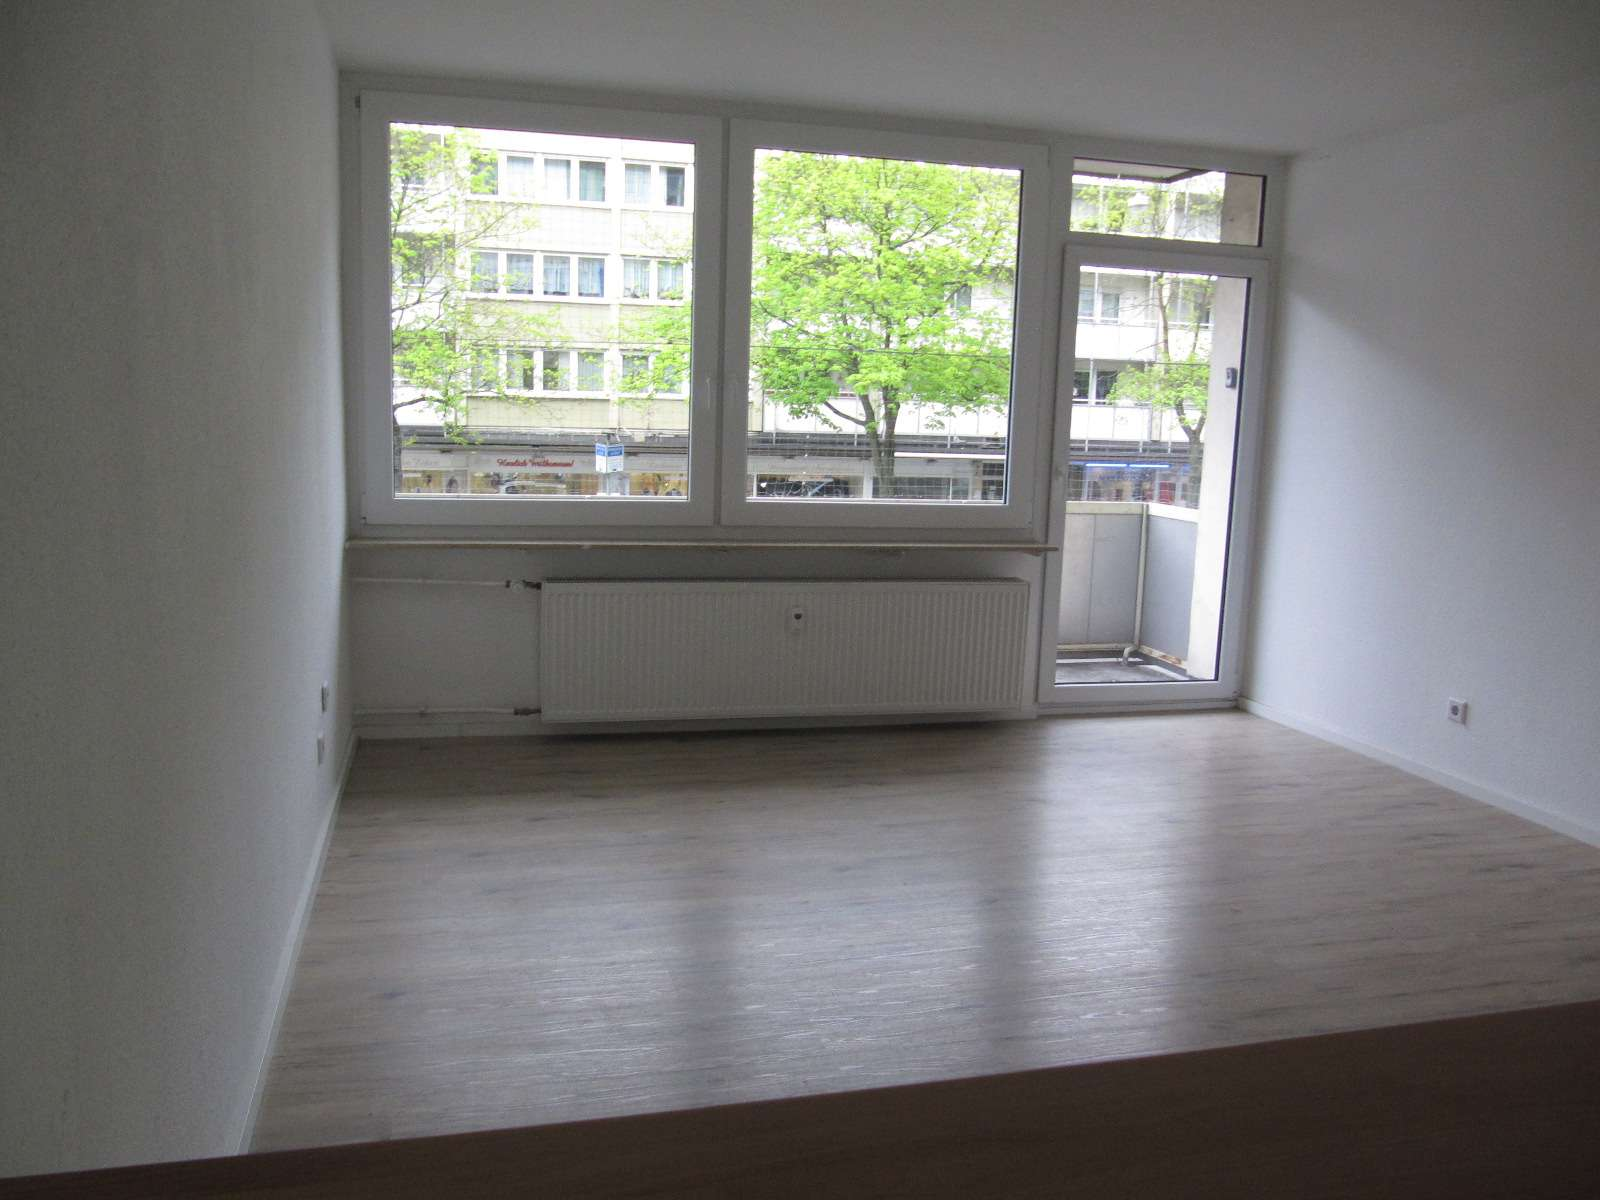 Bayreuther Straße ! 1-ZW, ca. 28 qm, Balkon,  1.OG mit Aufzug